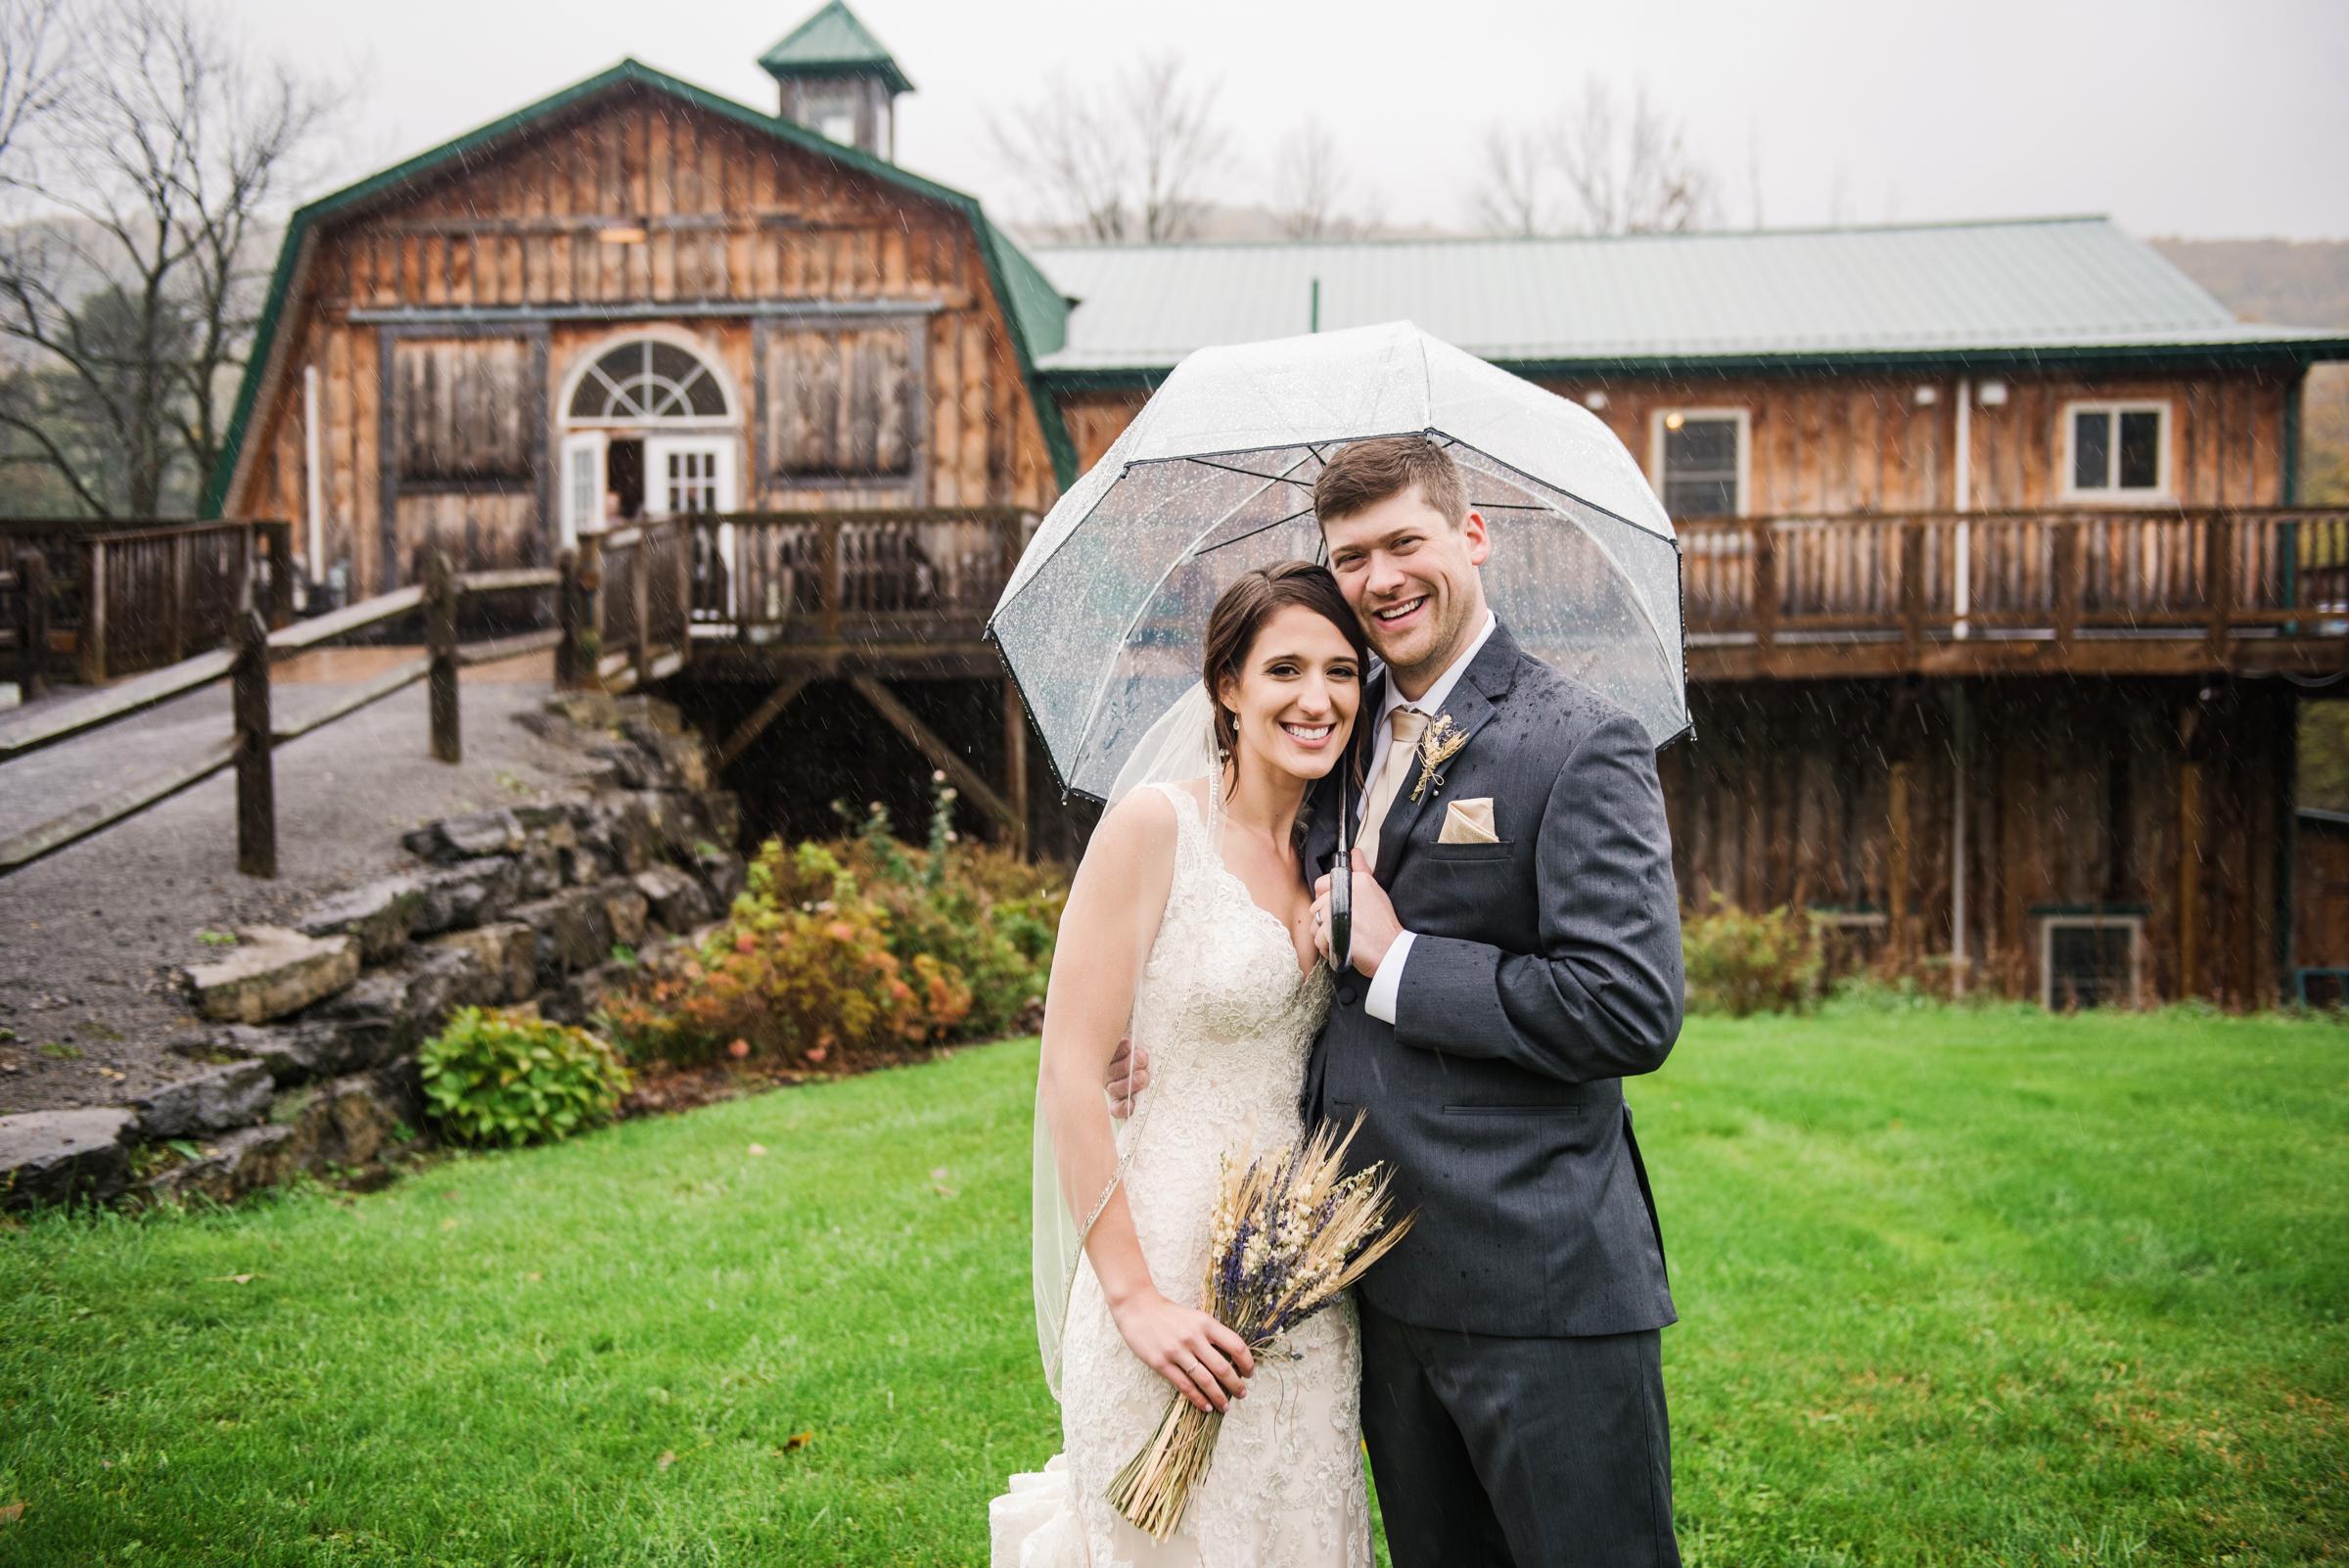 Wolf_Oak_Acres_Central_NY_Wedding_JILL_STUDIO_Rochester_NY_Photographer_DSC_7549.jpg